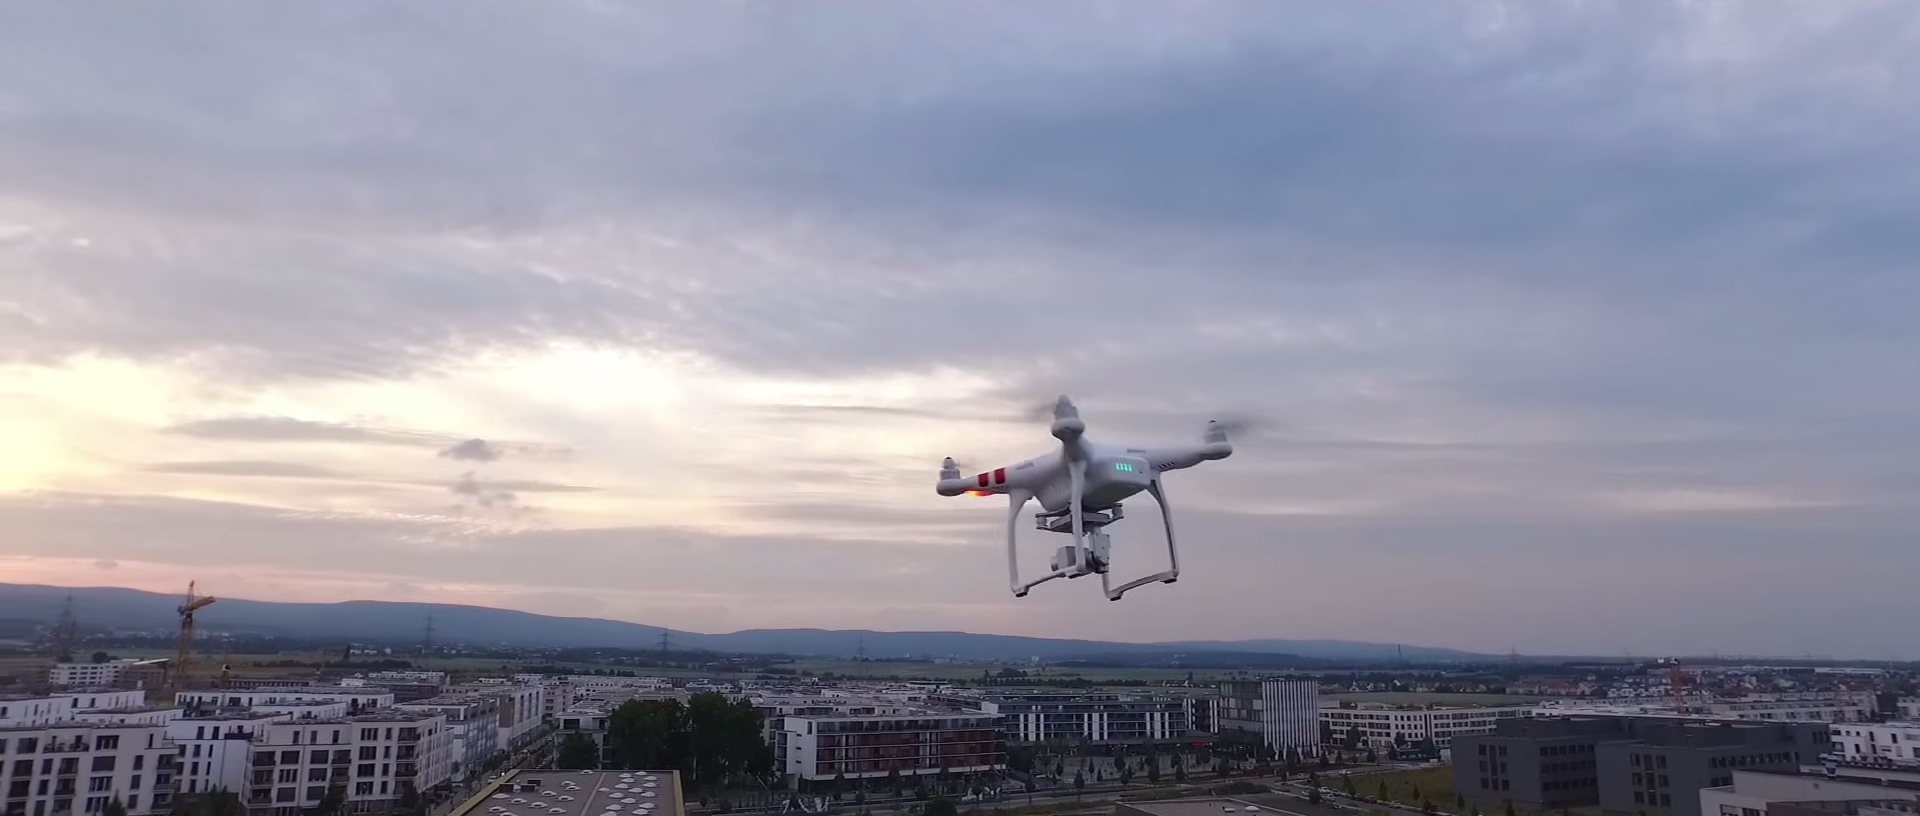 DI Phantom 3 drone